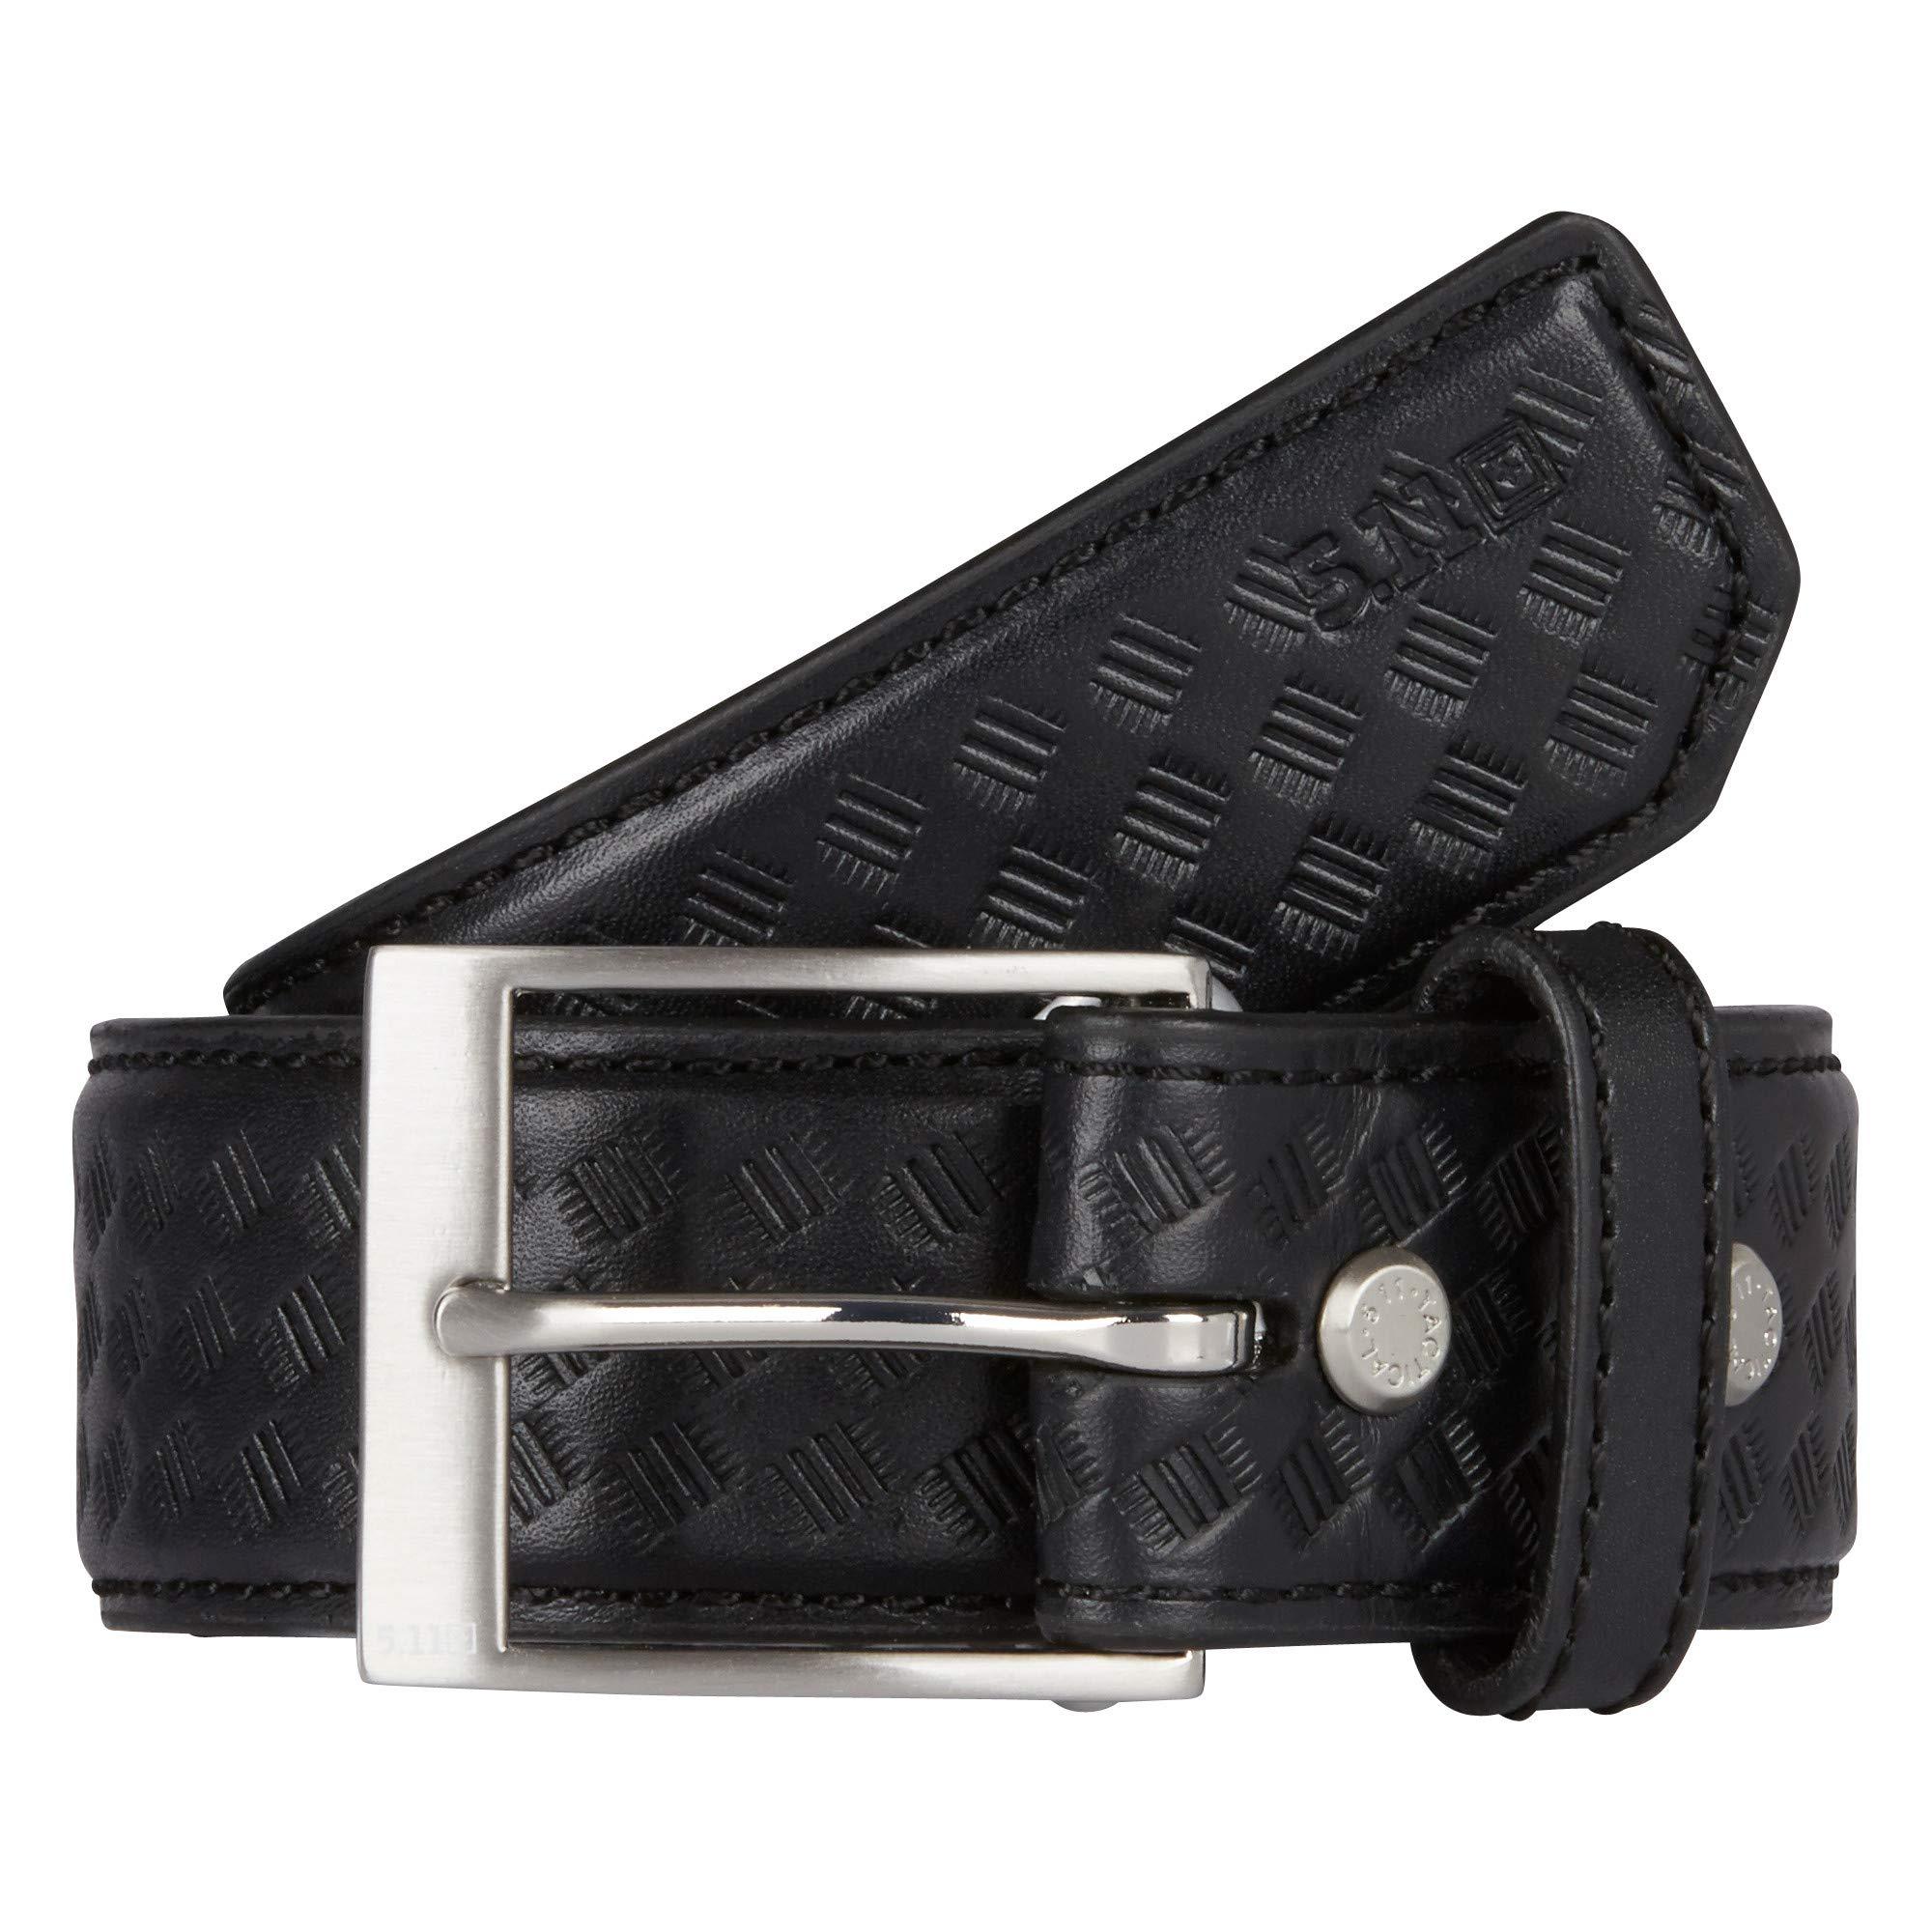 5.11 Tactical #59503 1.5-Inch Basketweave Leather Belt (Black, 3X-Large)